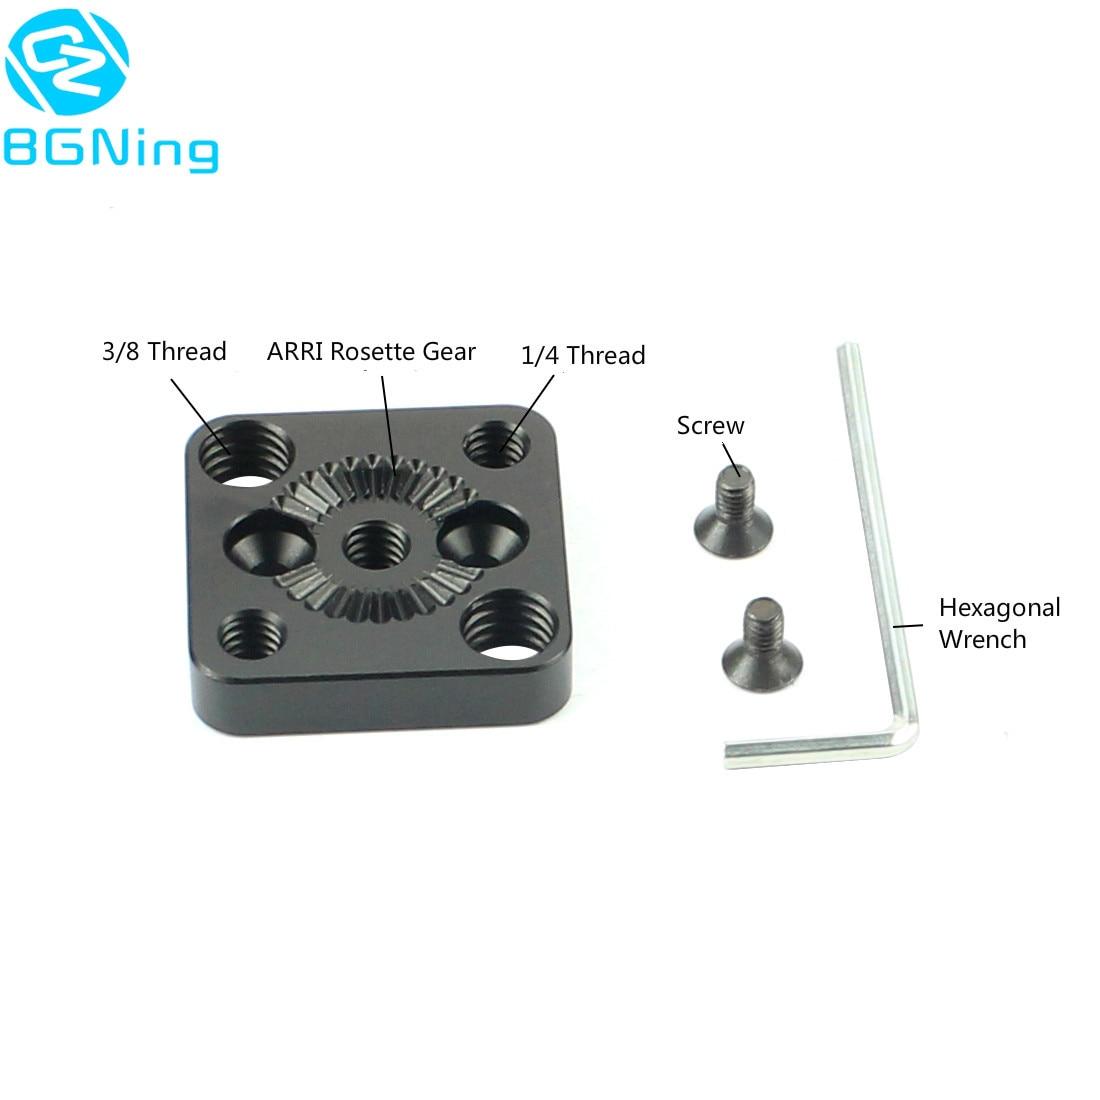 OEM Camera Mount 1//4-20 Screws 3-Pack Use for DJI Ronin-S